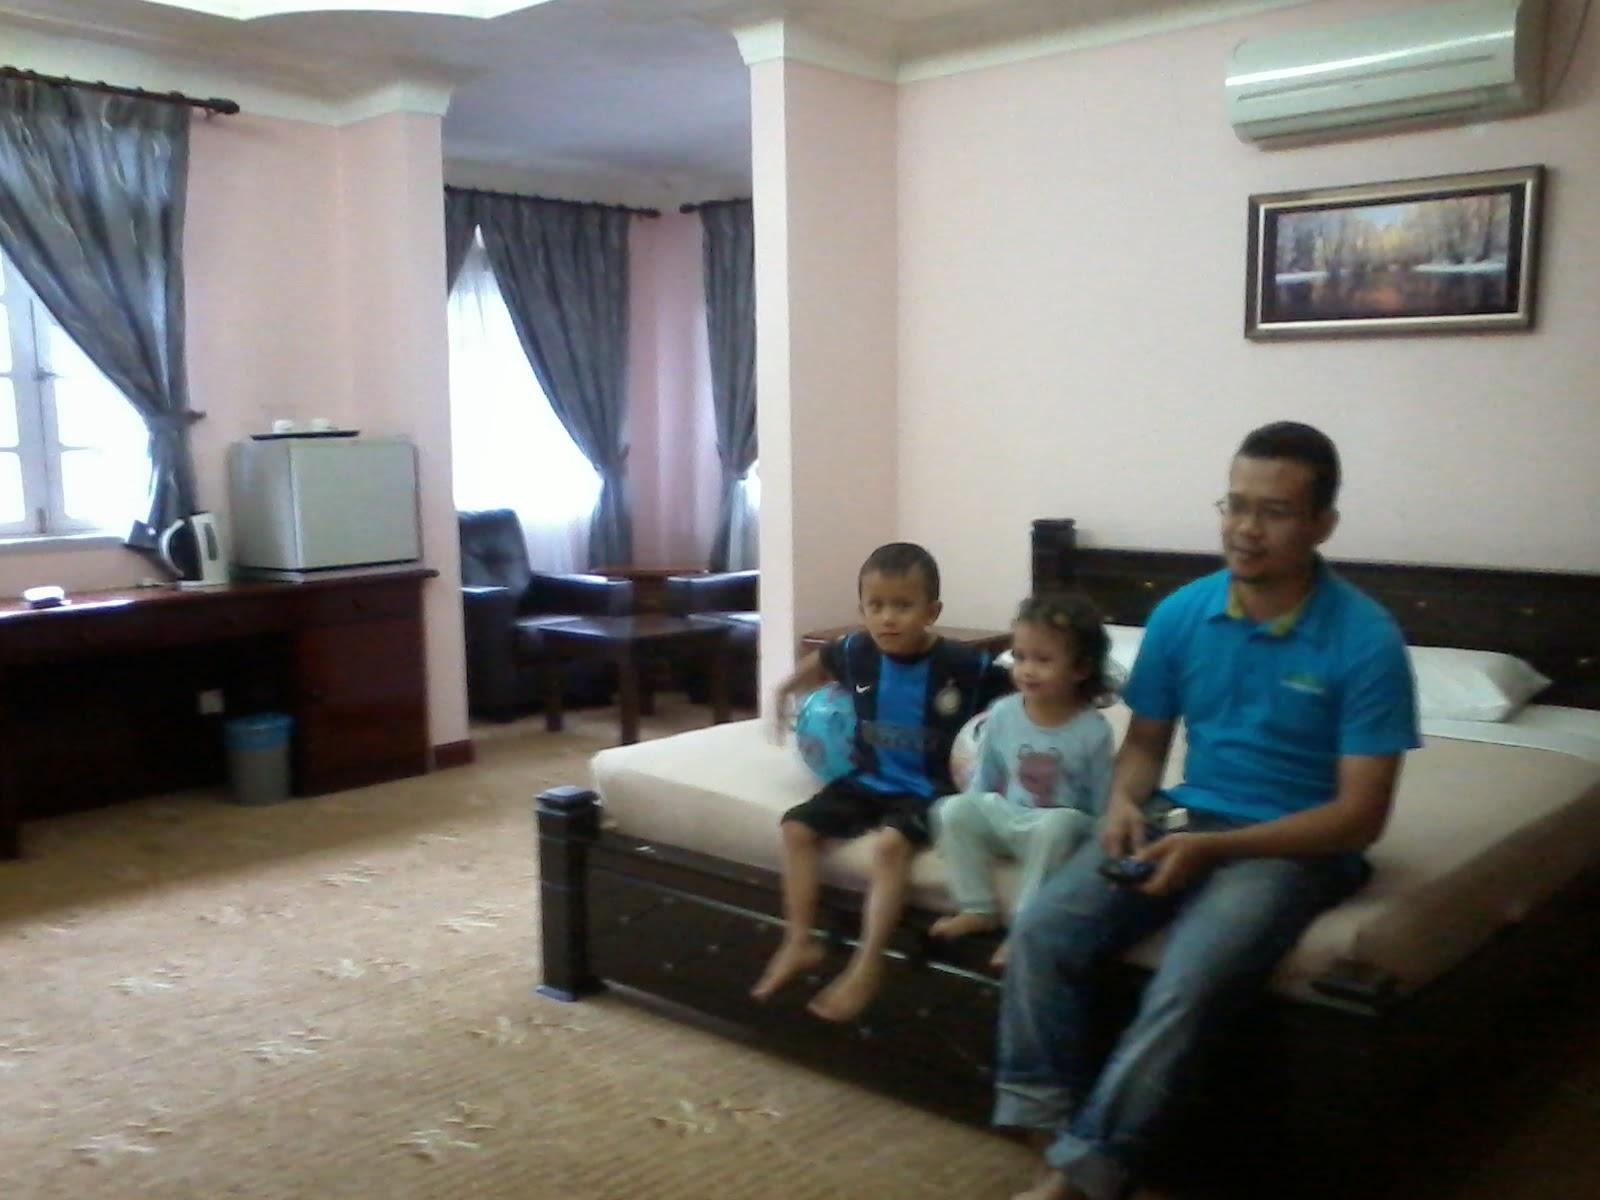 Rumah Peranginan Persekutuan Bukit Fraser Fraser S Hill Pahang Malaysia Gambleh J